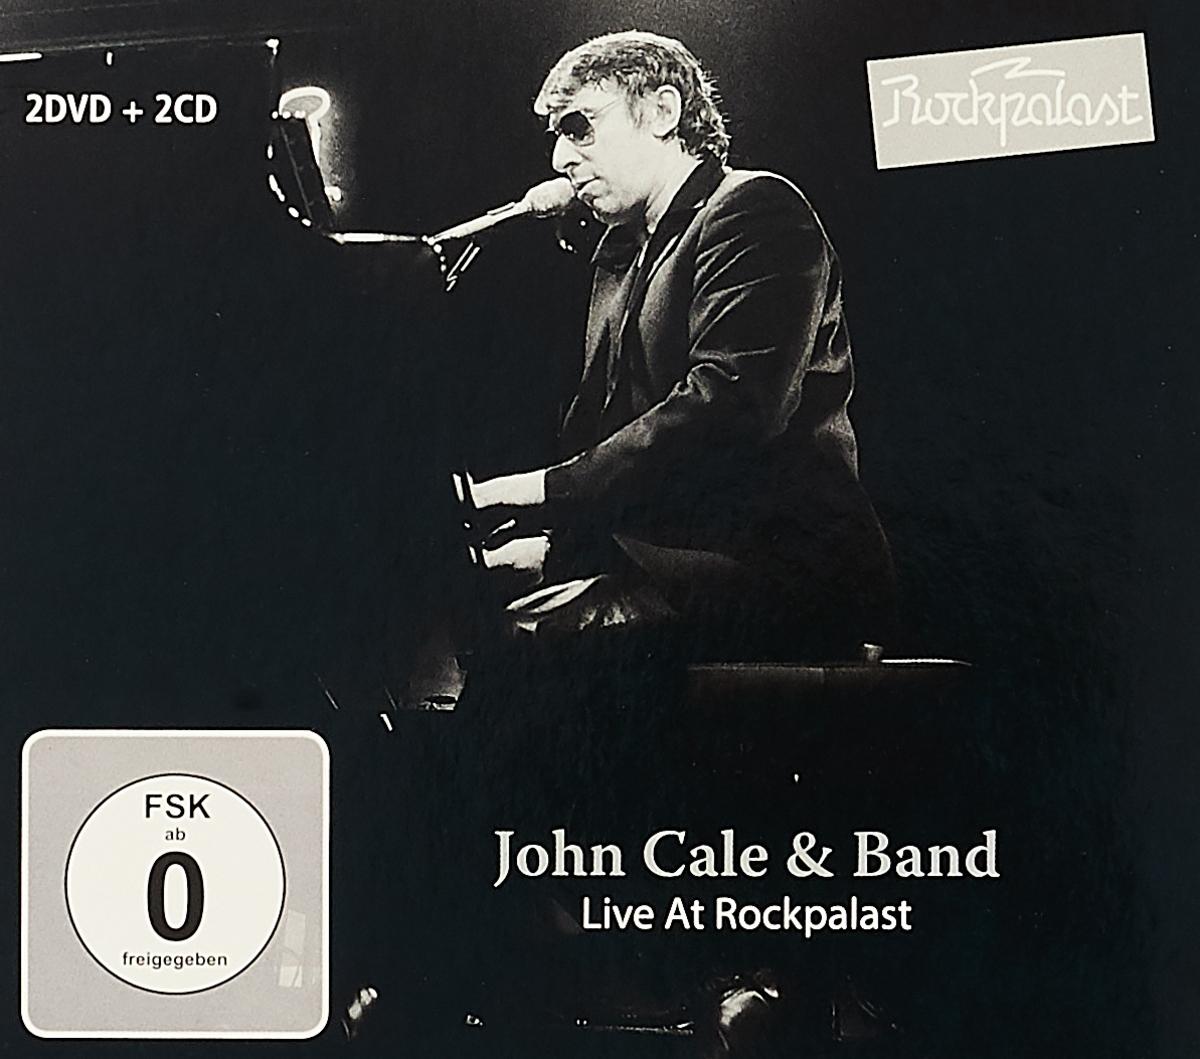 Джон Кейл John Cale. Live At Rockpalast (Bonus) (2 CD + 2 DVD)